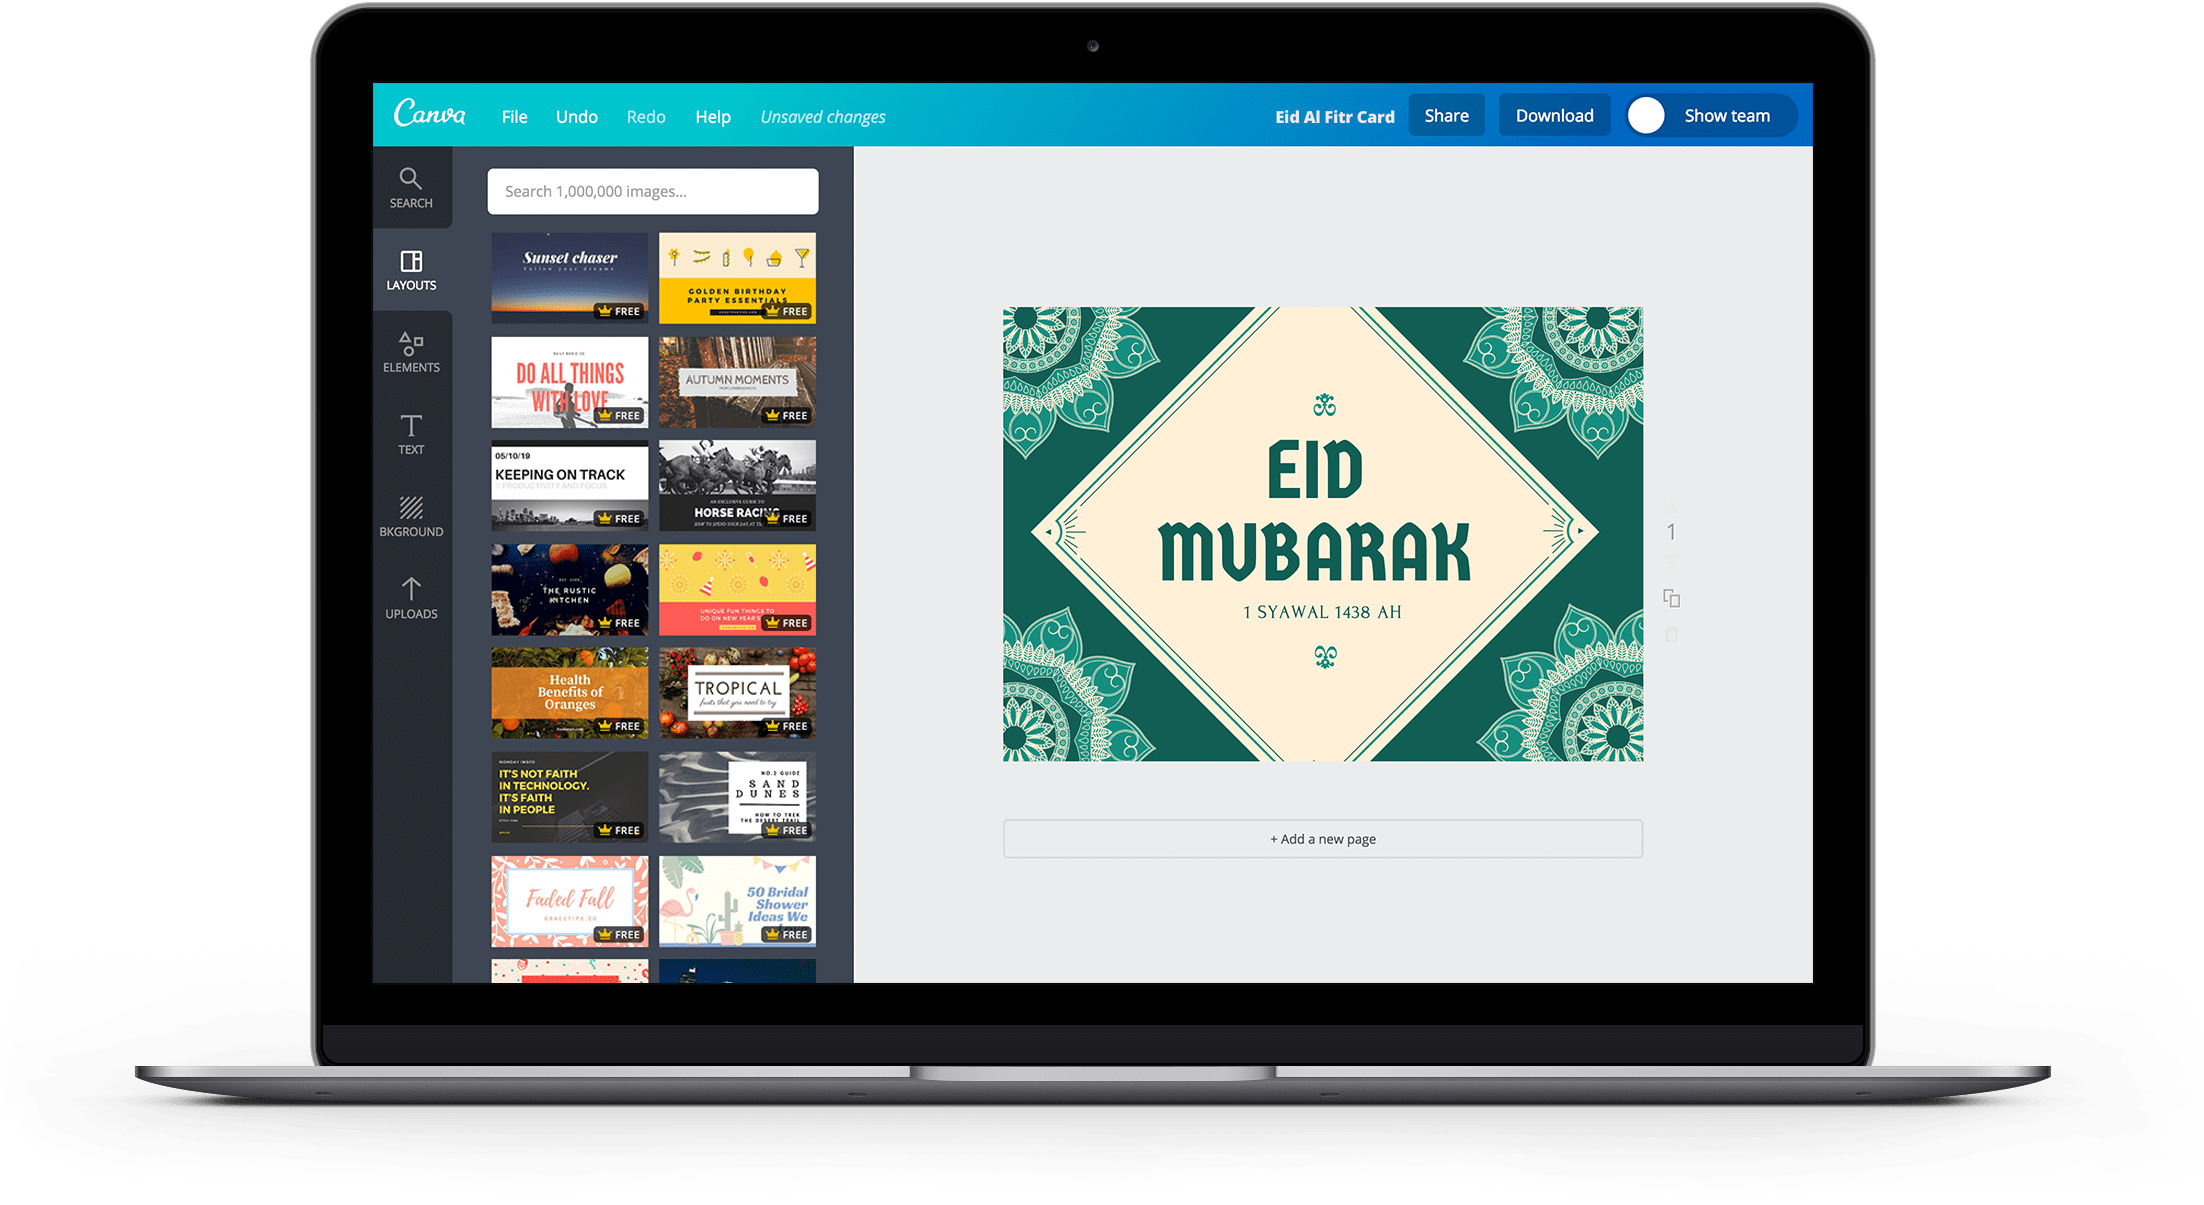 Eid Al Fitr Card